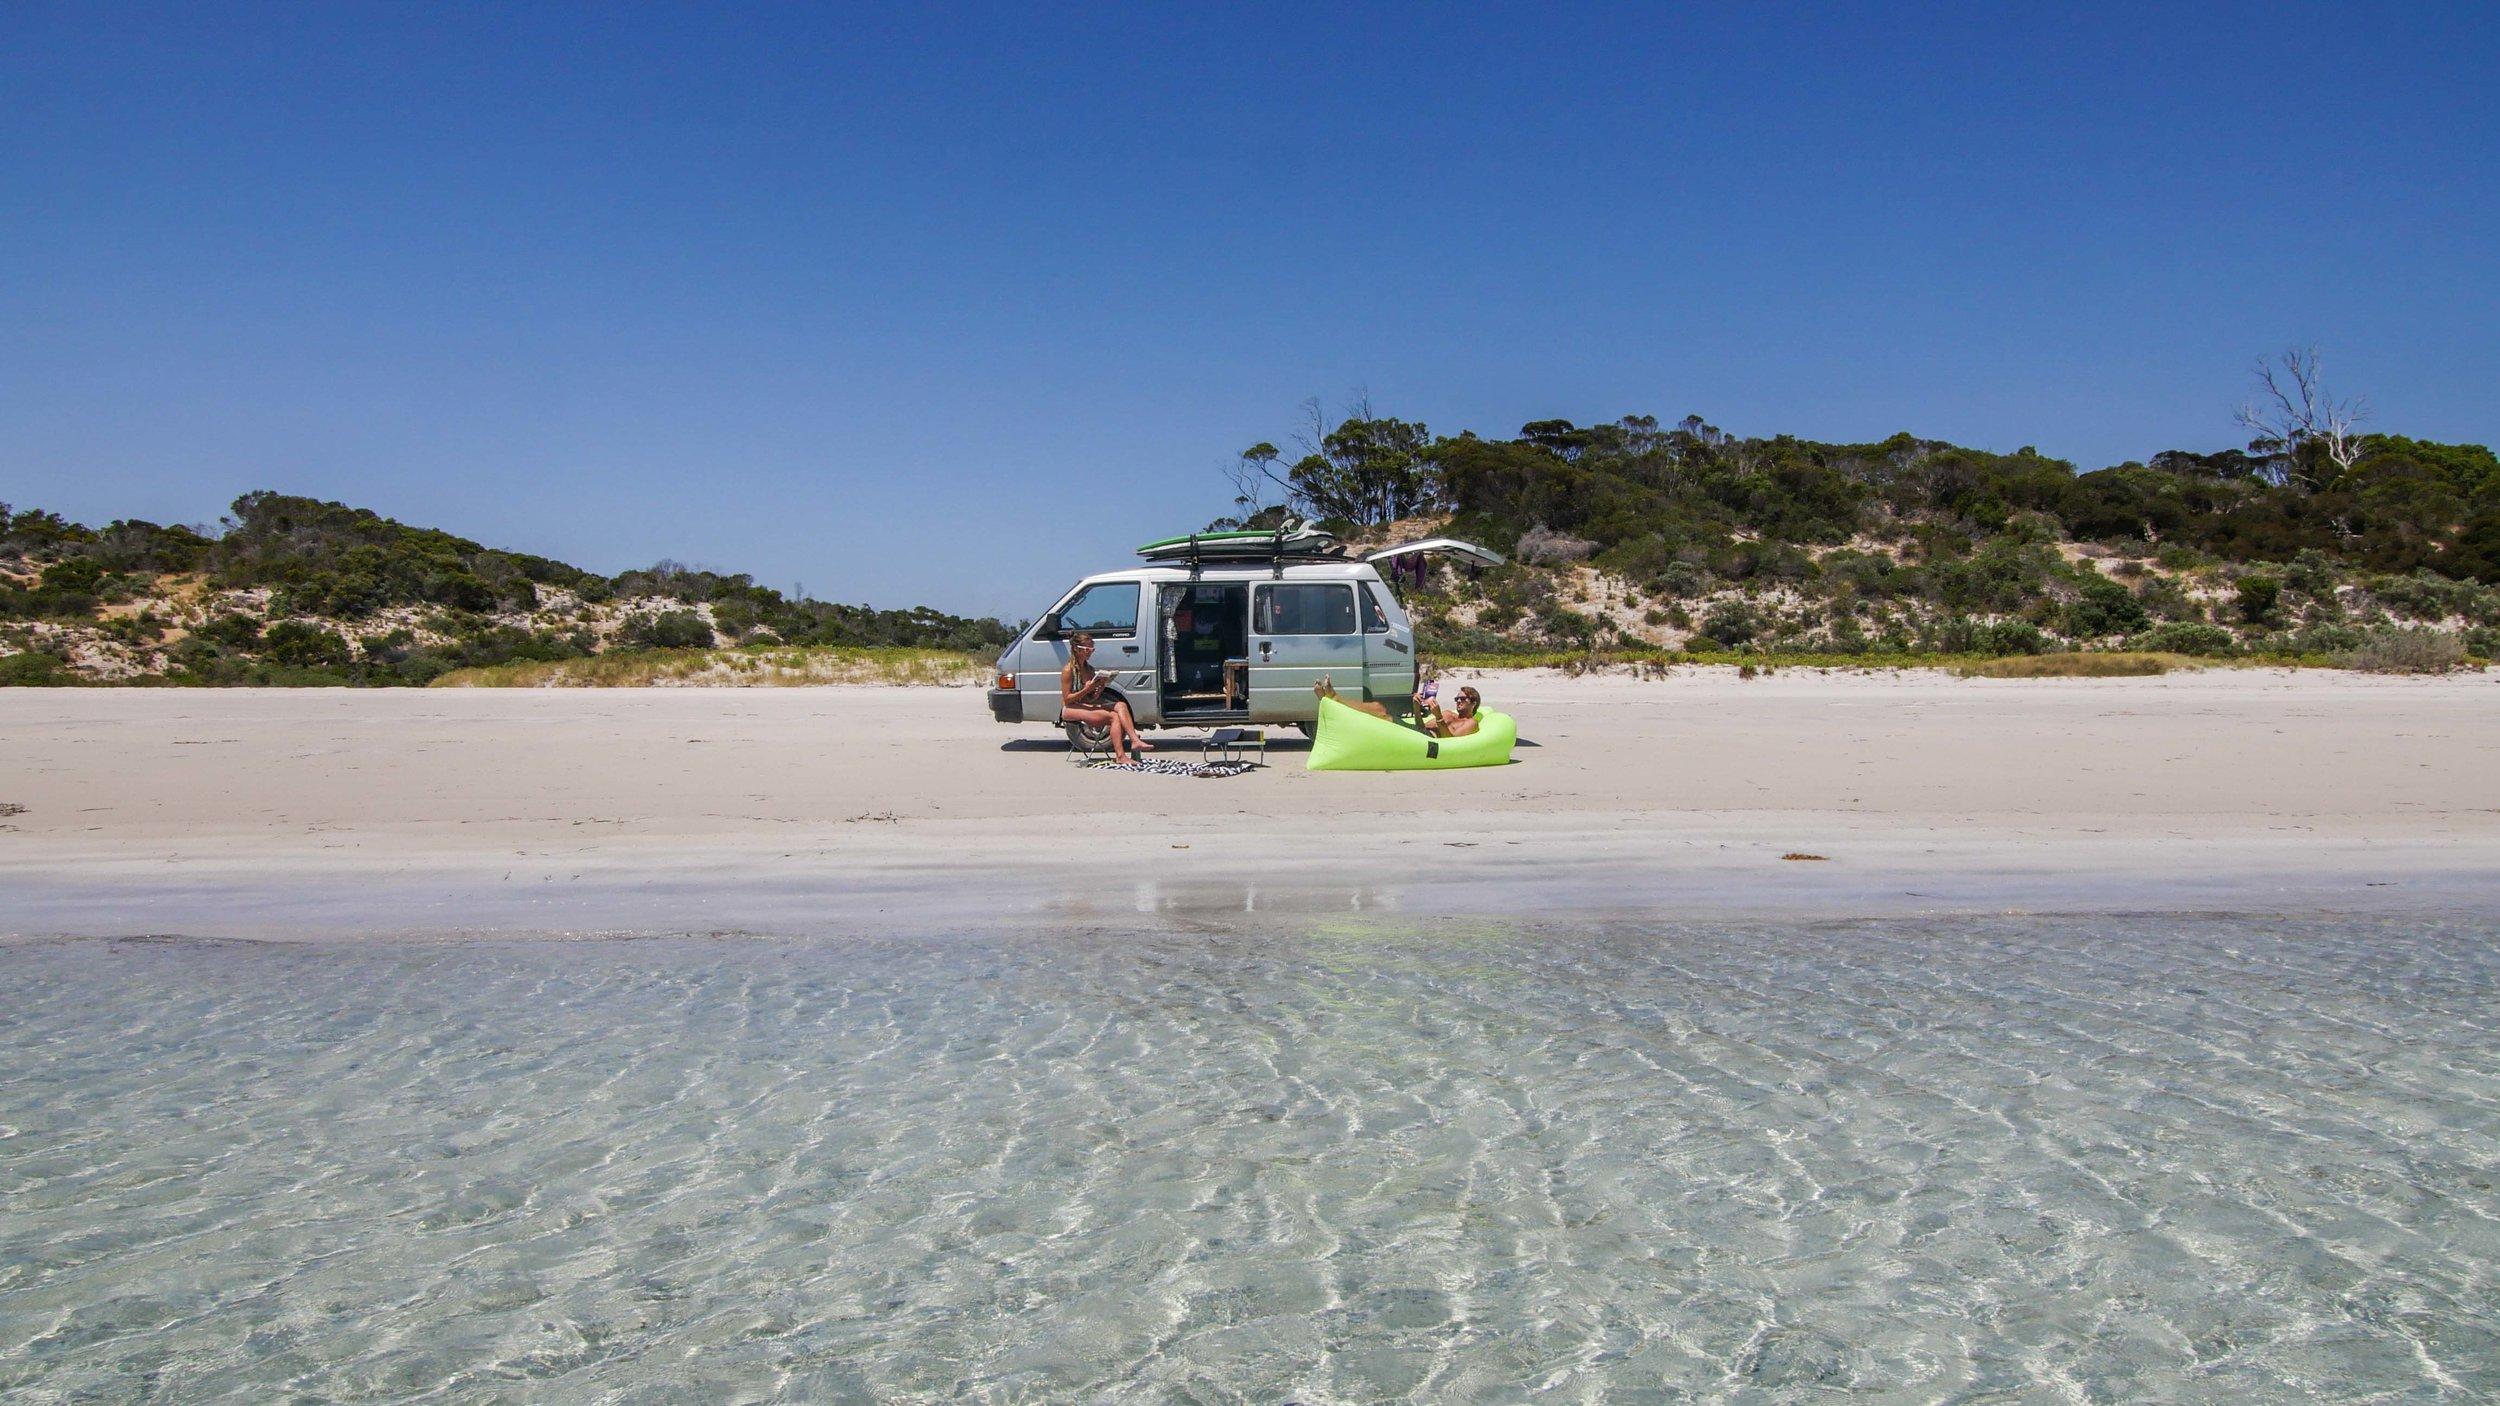 kangaroo island south australia (12 of 16).jpg